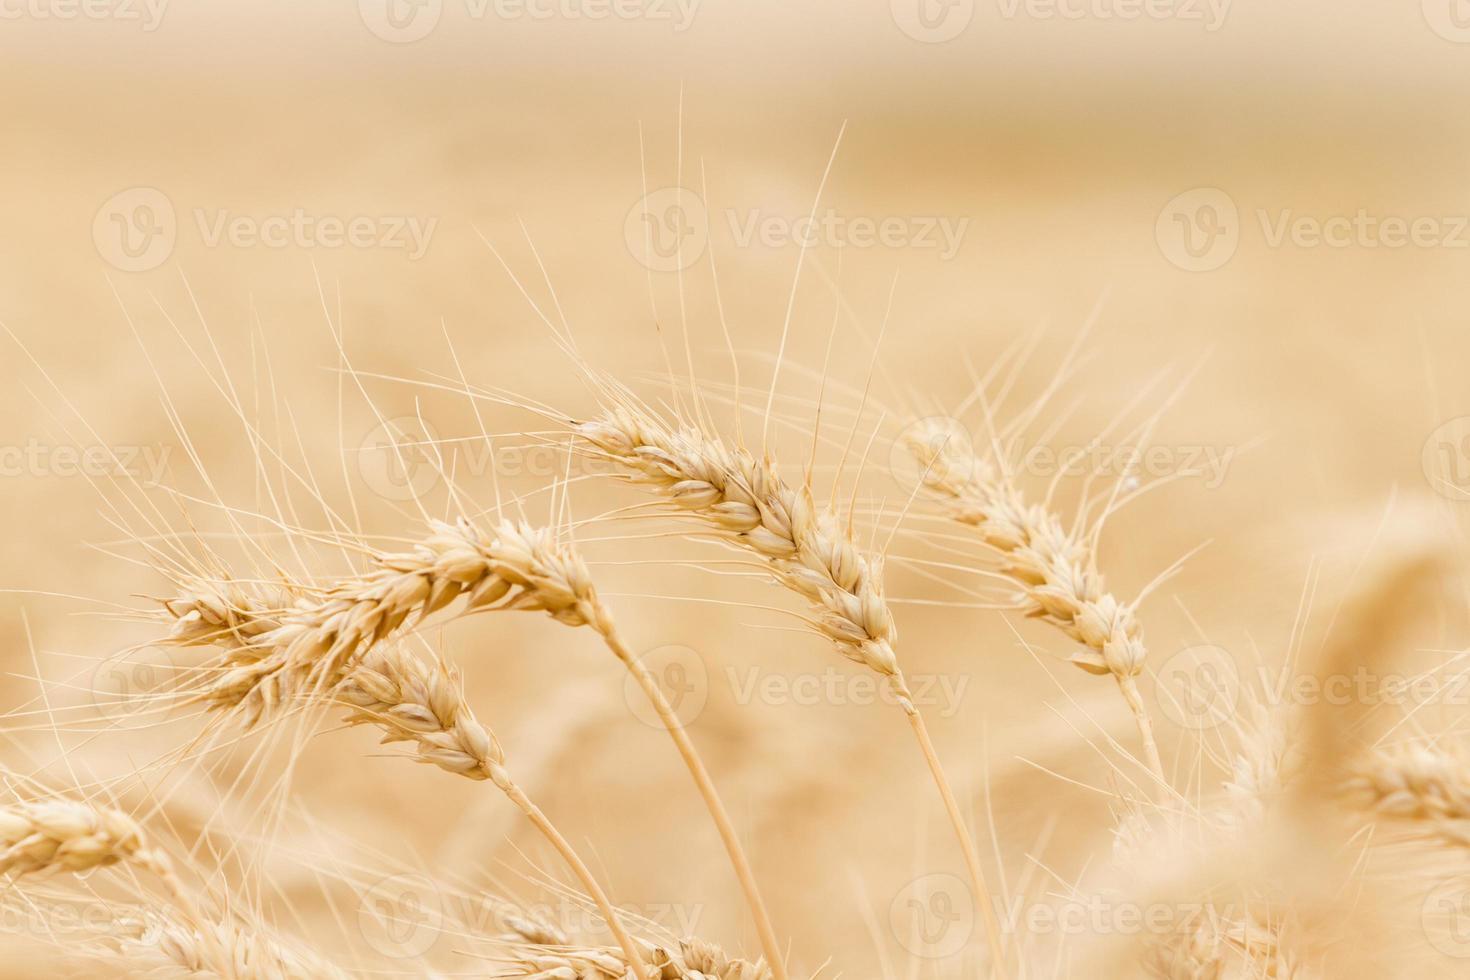 Wheat ear photo